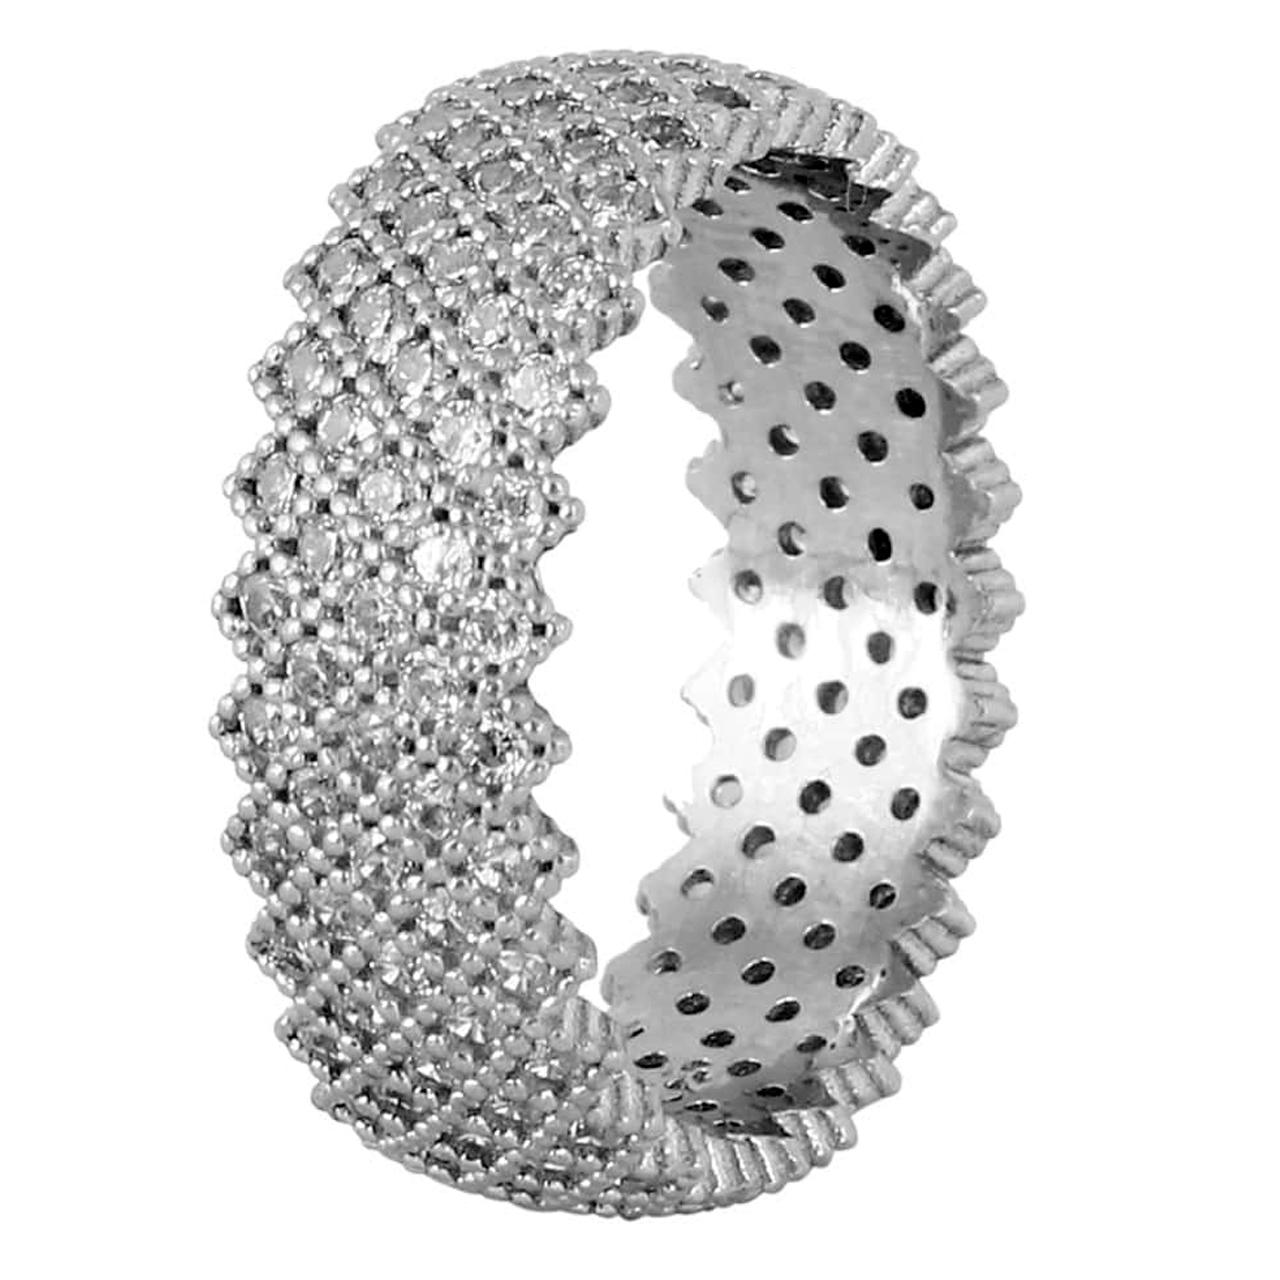 انگشتر نقره زنانه مد و کلاس کد 180323-6.5 -  - 2